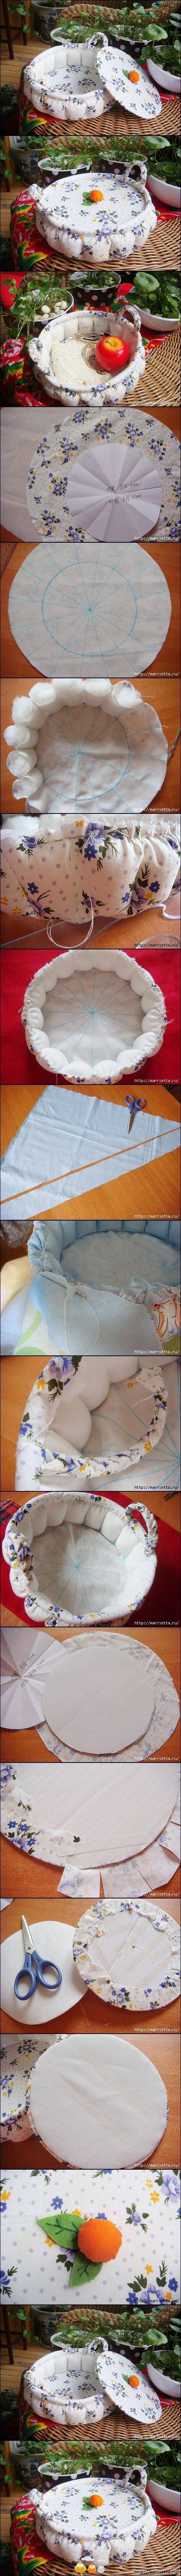 Segmented fabric basket.